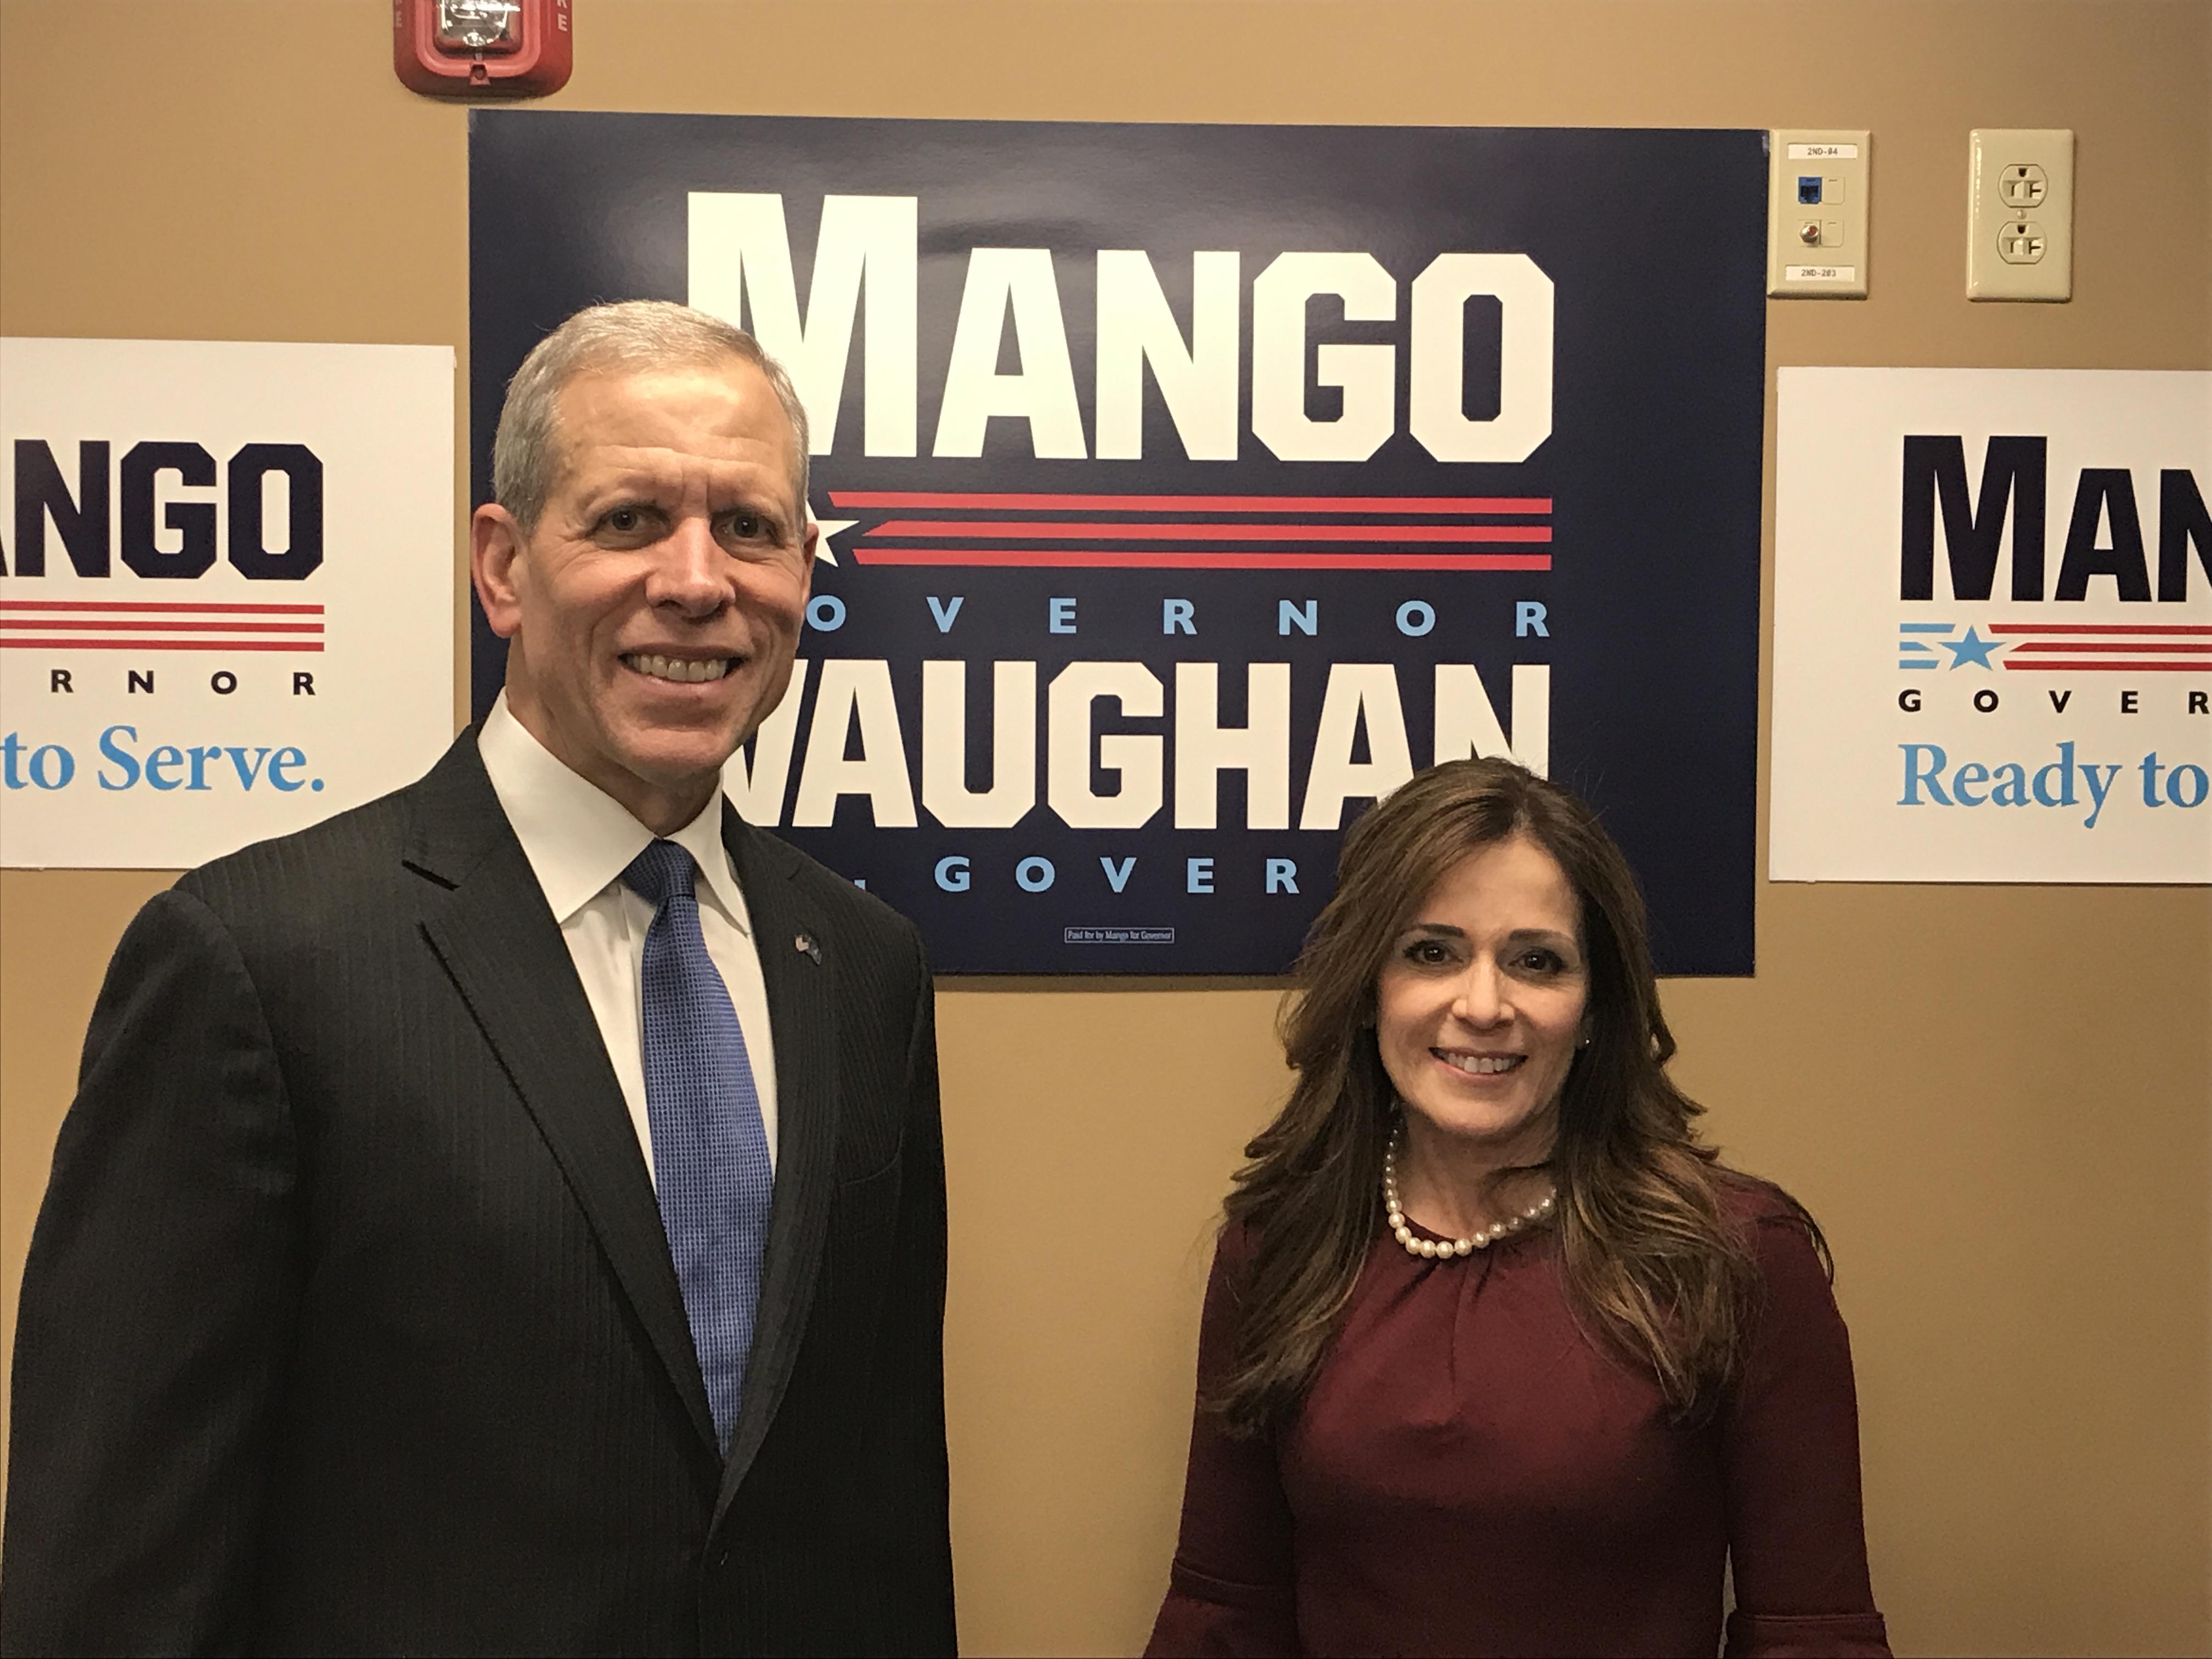 Paul Mango and Diana Irey Vaughan